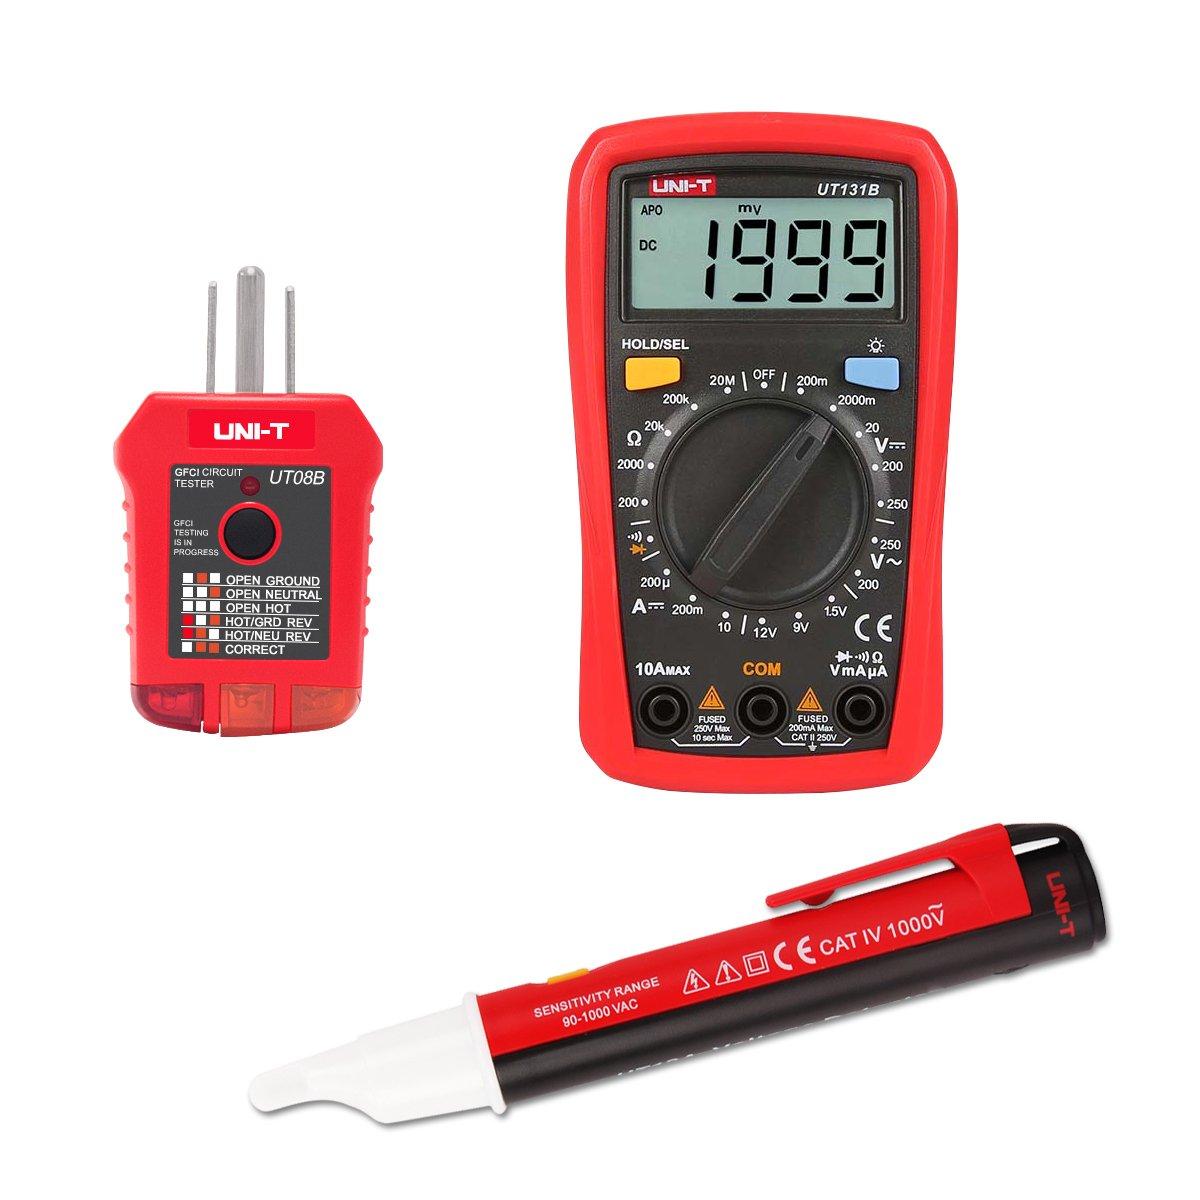 Signstek Maintenance and Test Electrical Test Kit, Including Palm Size Multimeter, Receptacle Tester and AC Voltage Detector by Signstek (Image #9)